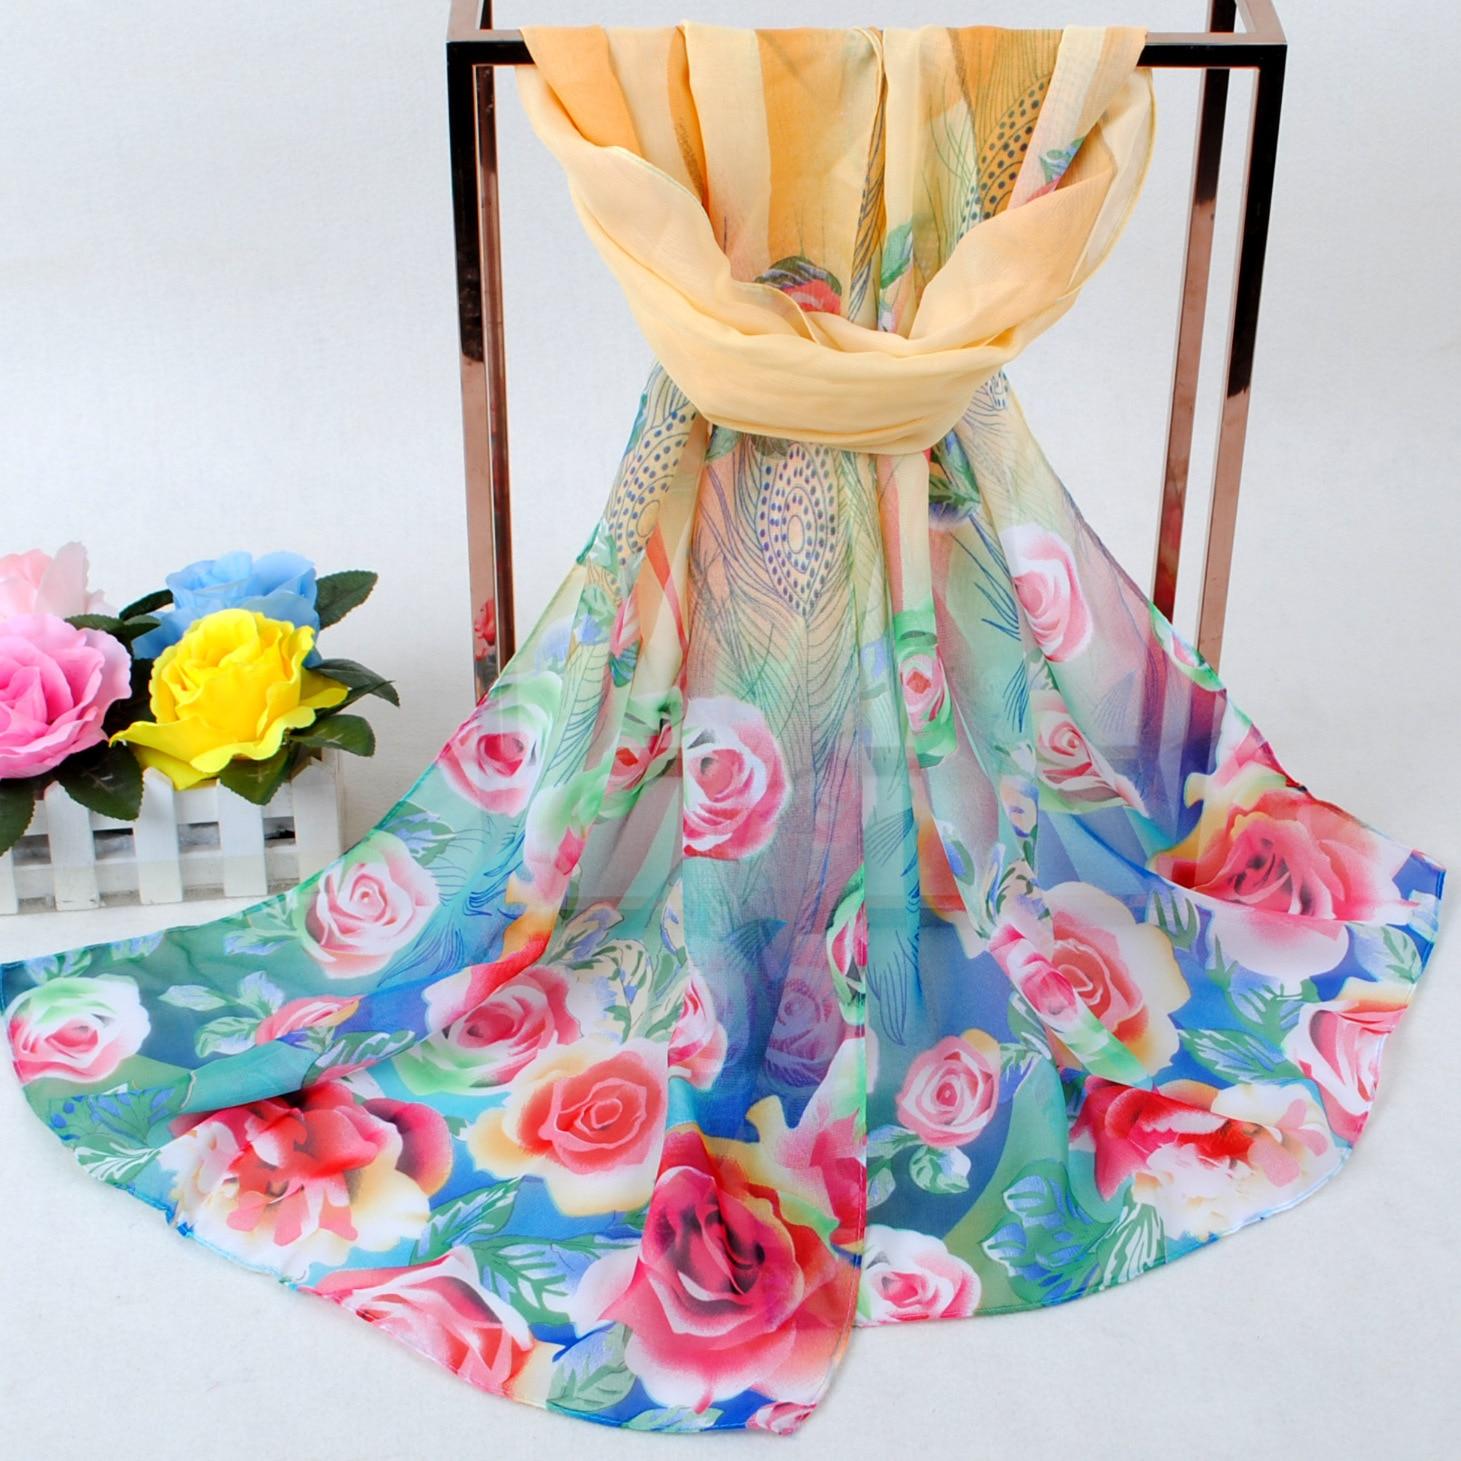 Spring And Summer Women Scarf 2019 New Pashmina Shawl Printed Cape Silk Chiffon Polyester Tippet Muffler Luxury Brand Bib